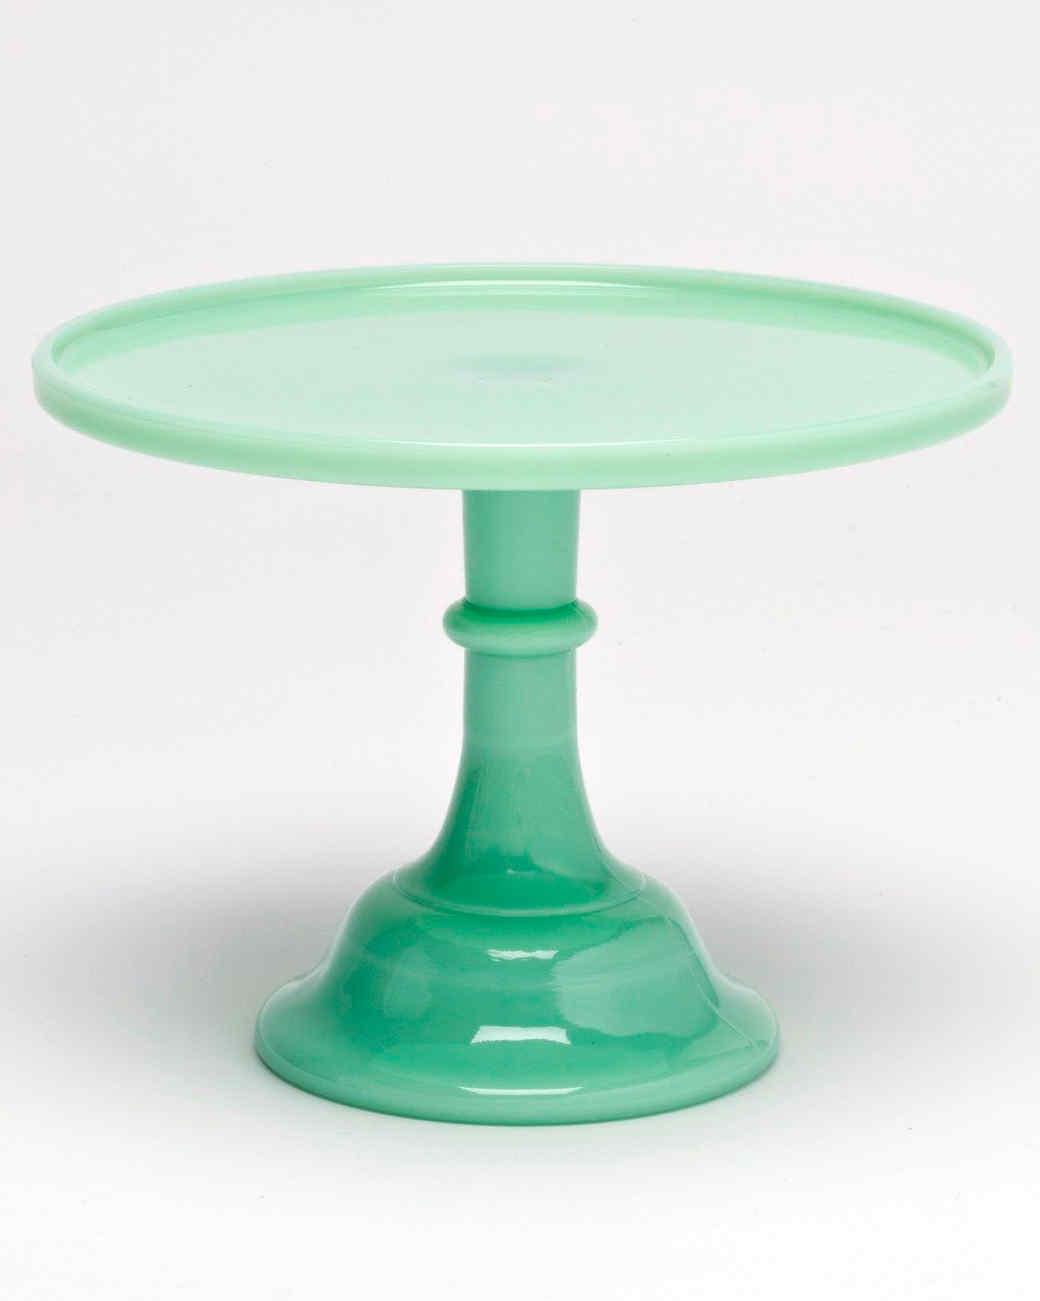 mosser-glass-cake-place-jadeite-0914.jpg